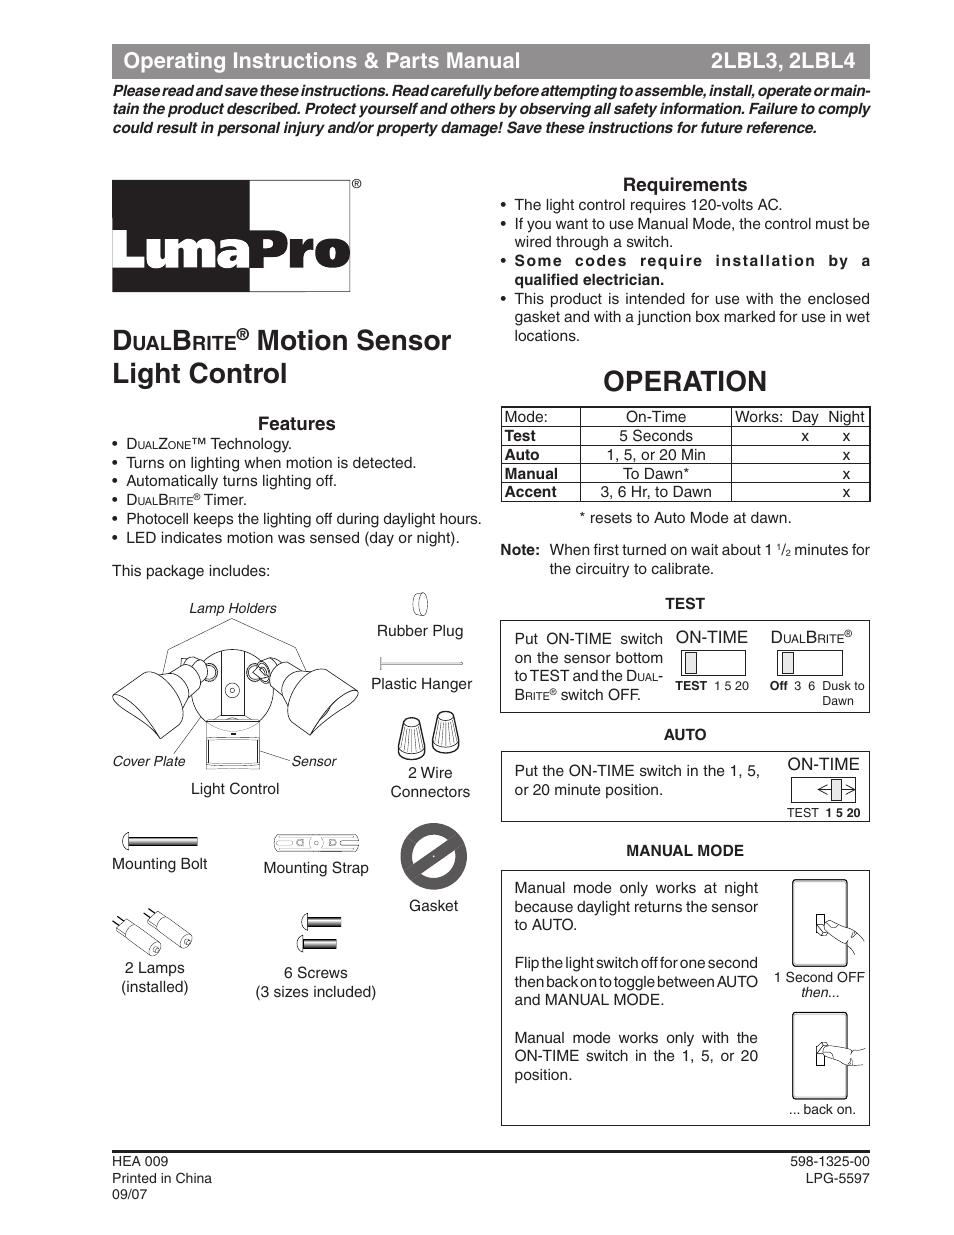 Heath Zenith Dualbrite Motion Sensor Light Control 2lbl3 User Manual 16 Pages Also For Dualbrite Motion Sensor Light Control 2lbl4